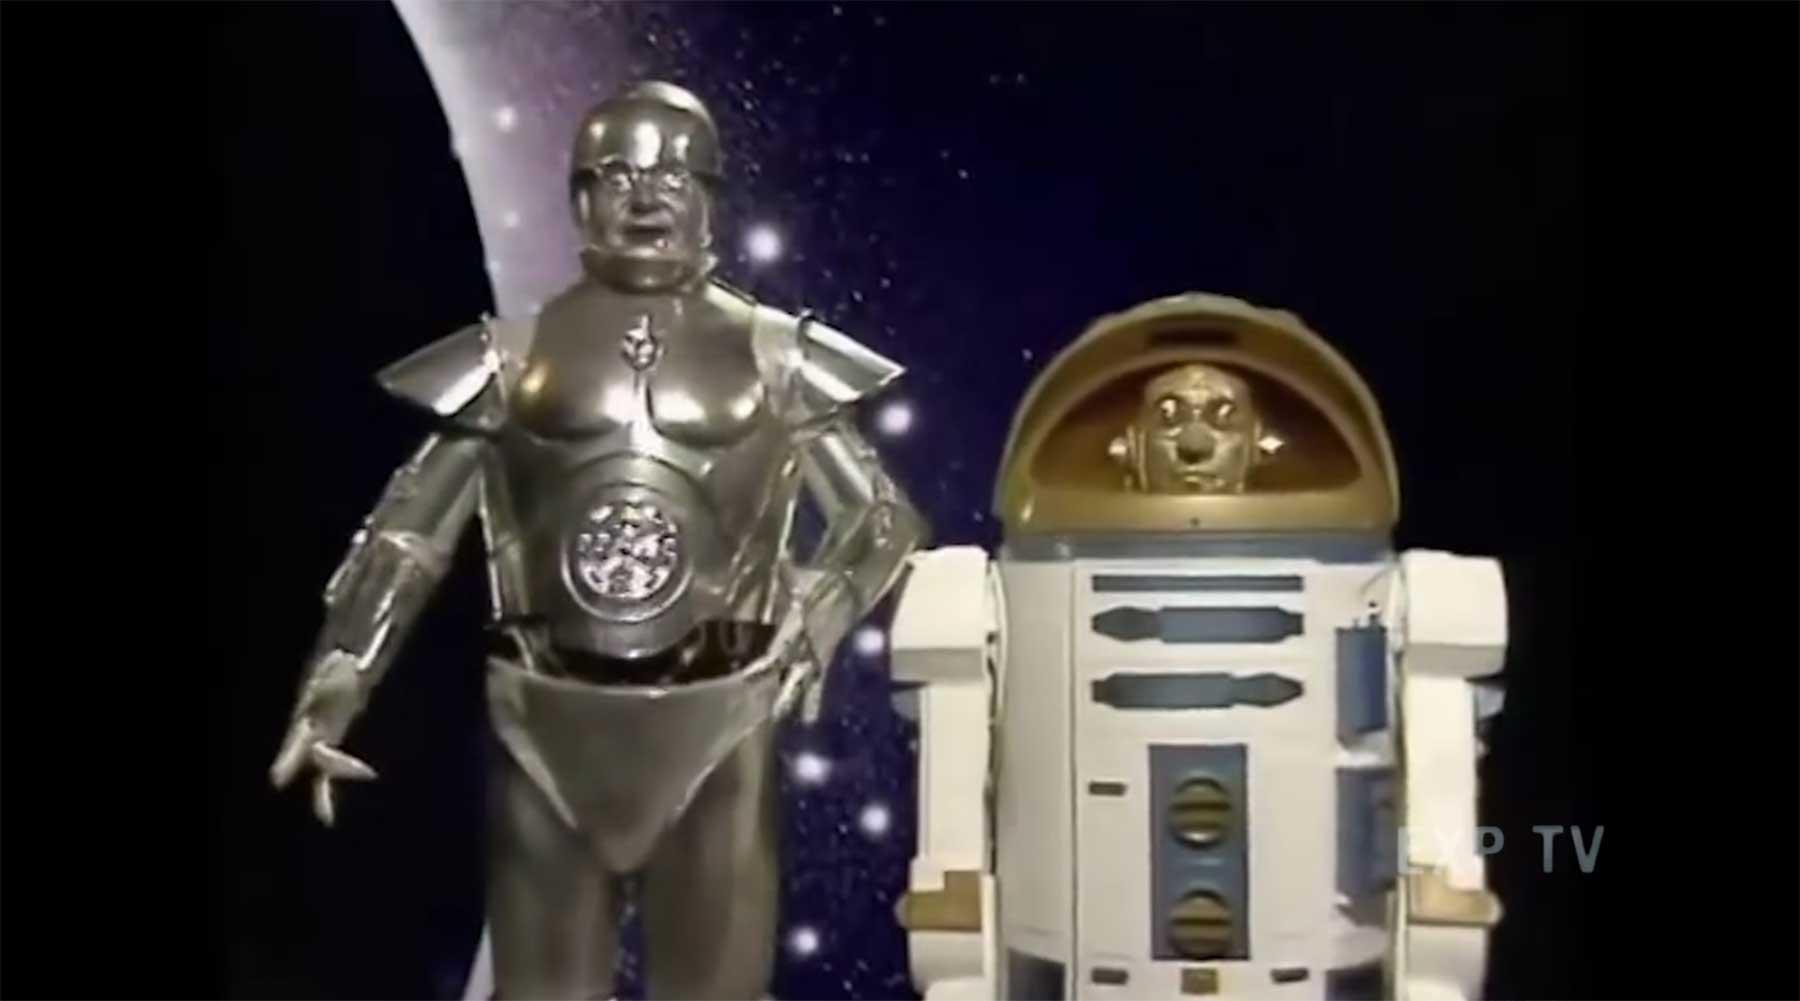 Star Wars Nothing But Star Wars star-wars-nothing-but-star-wars